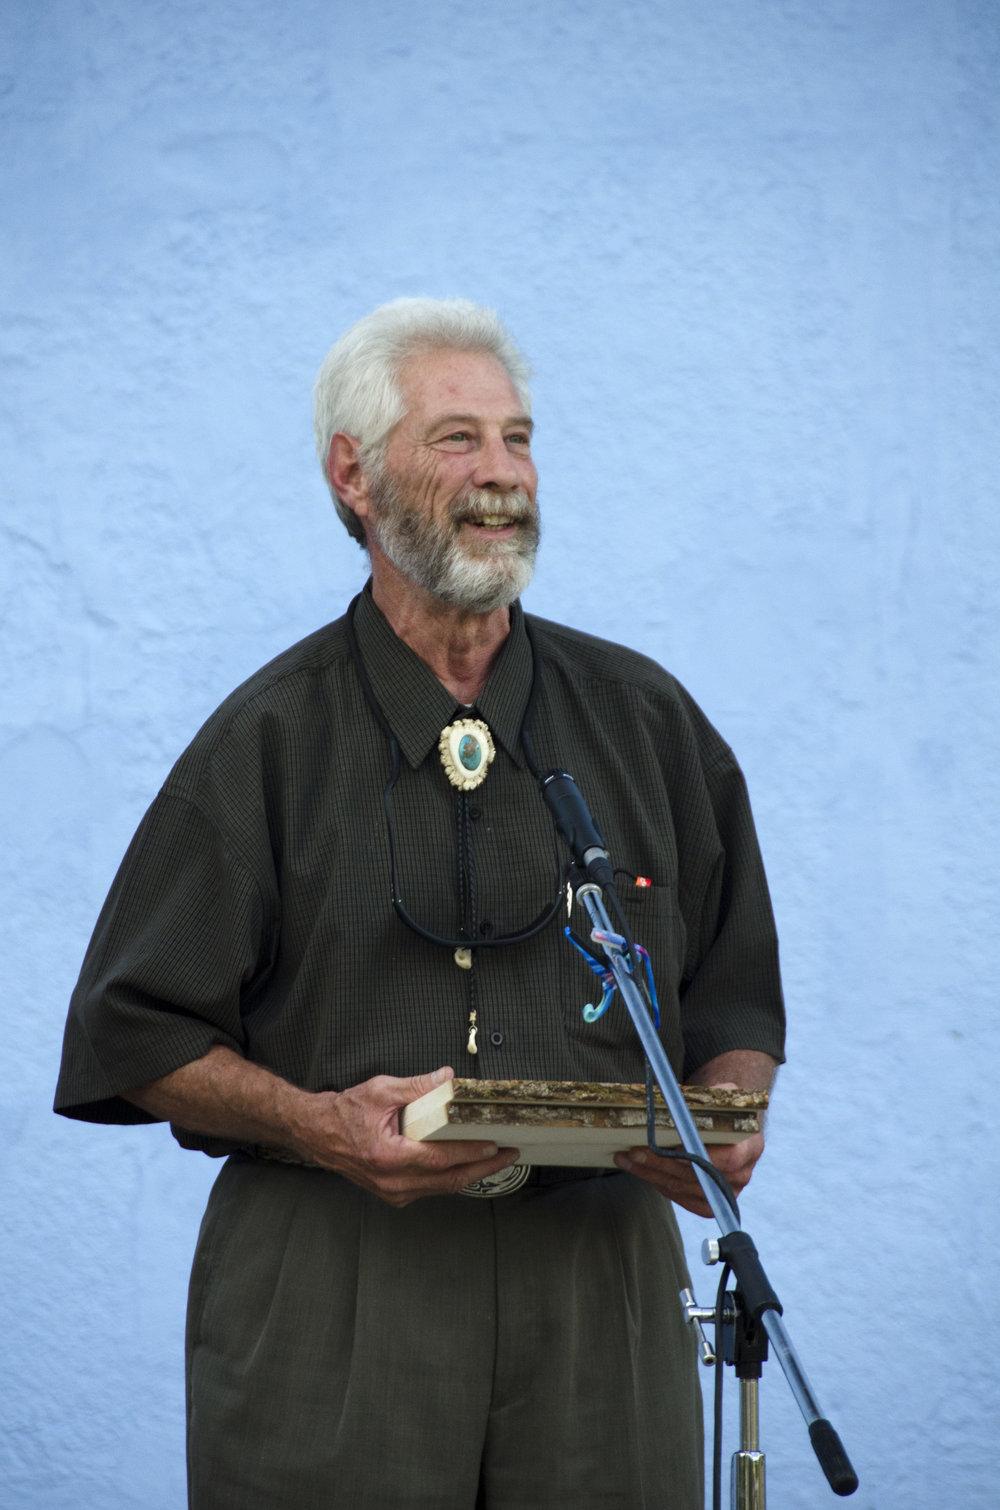 CITIZEN PLANNER AWARD. Ron Gardiner of Questa, New Mexico.Photo by Rachel Girt.